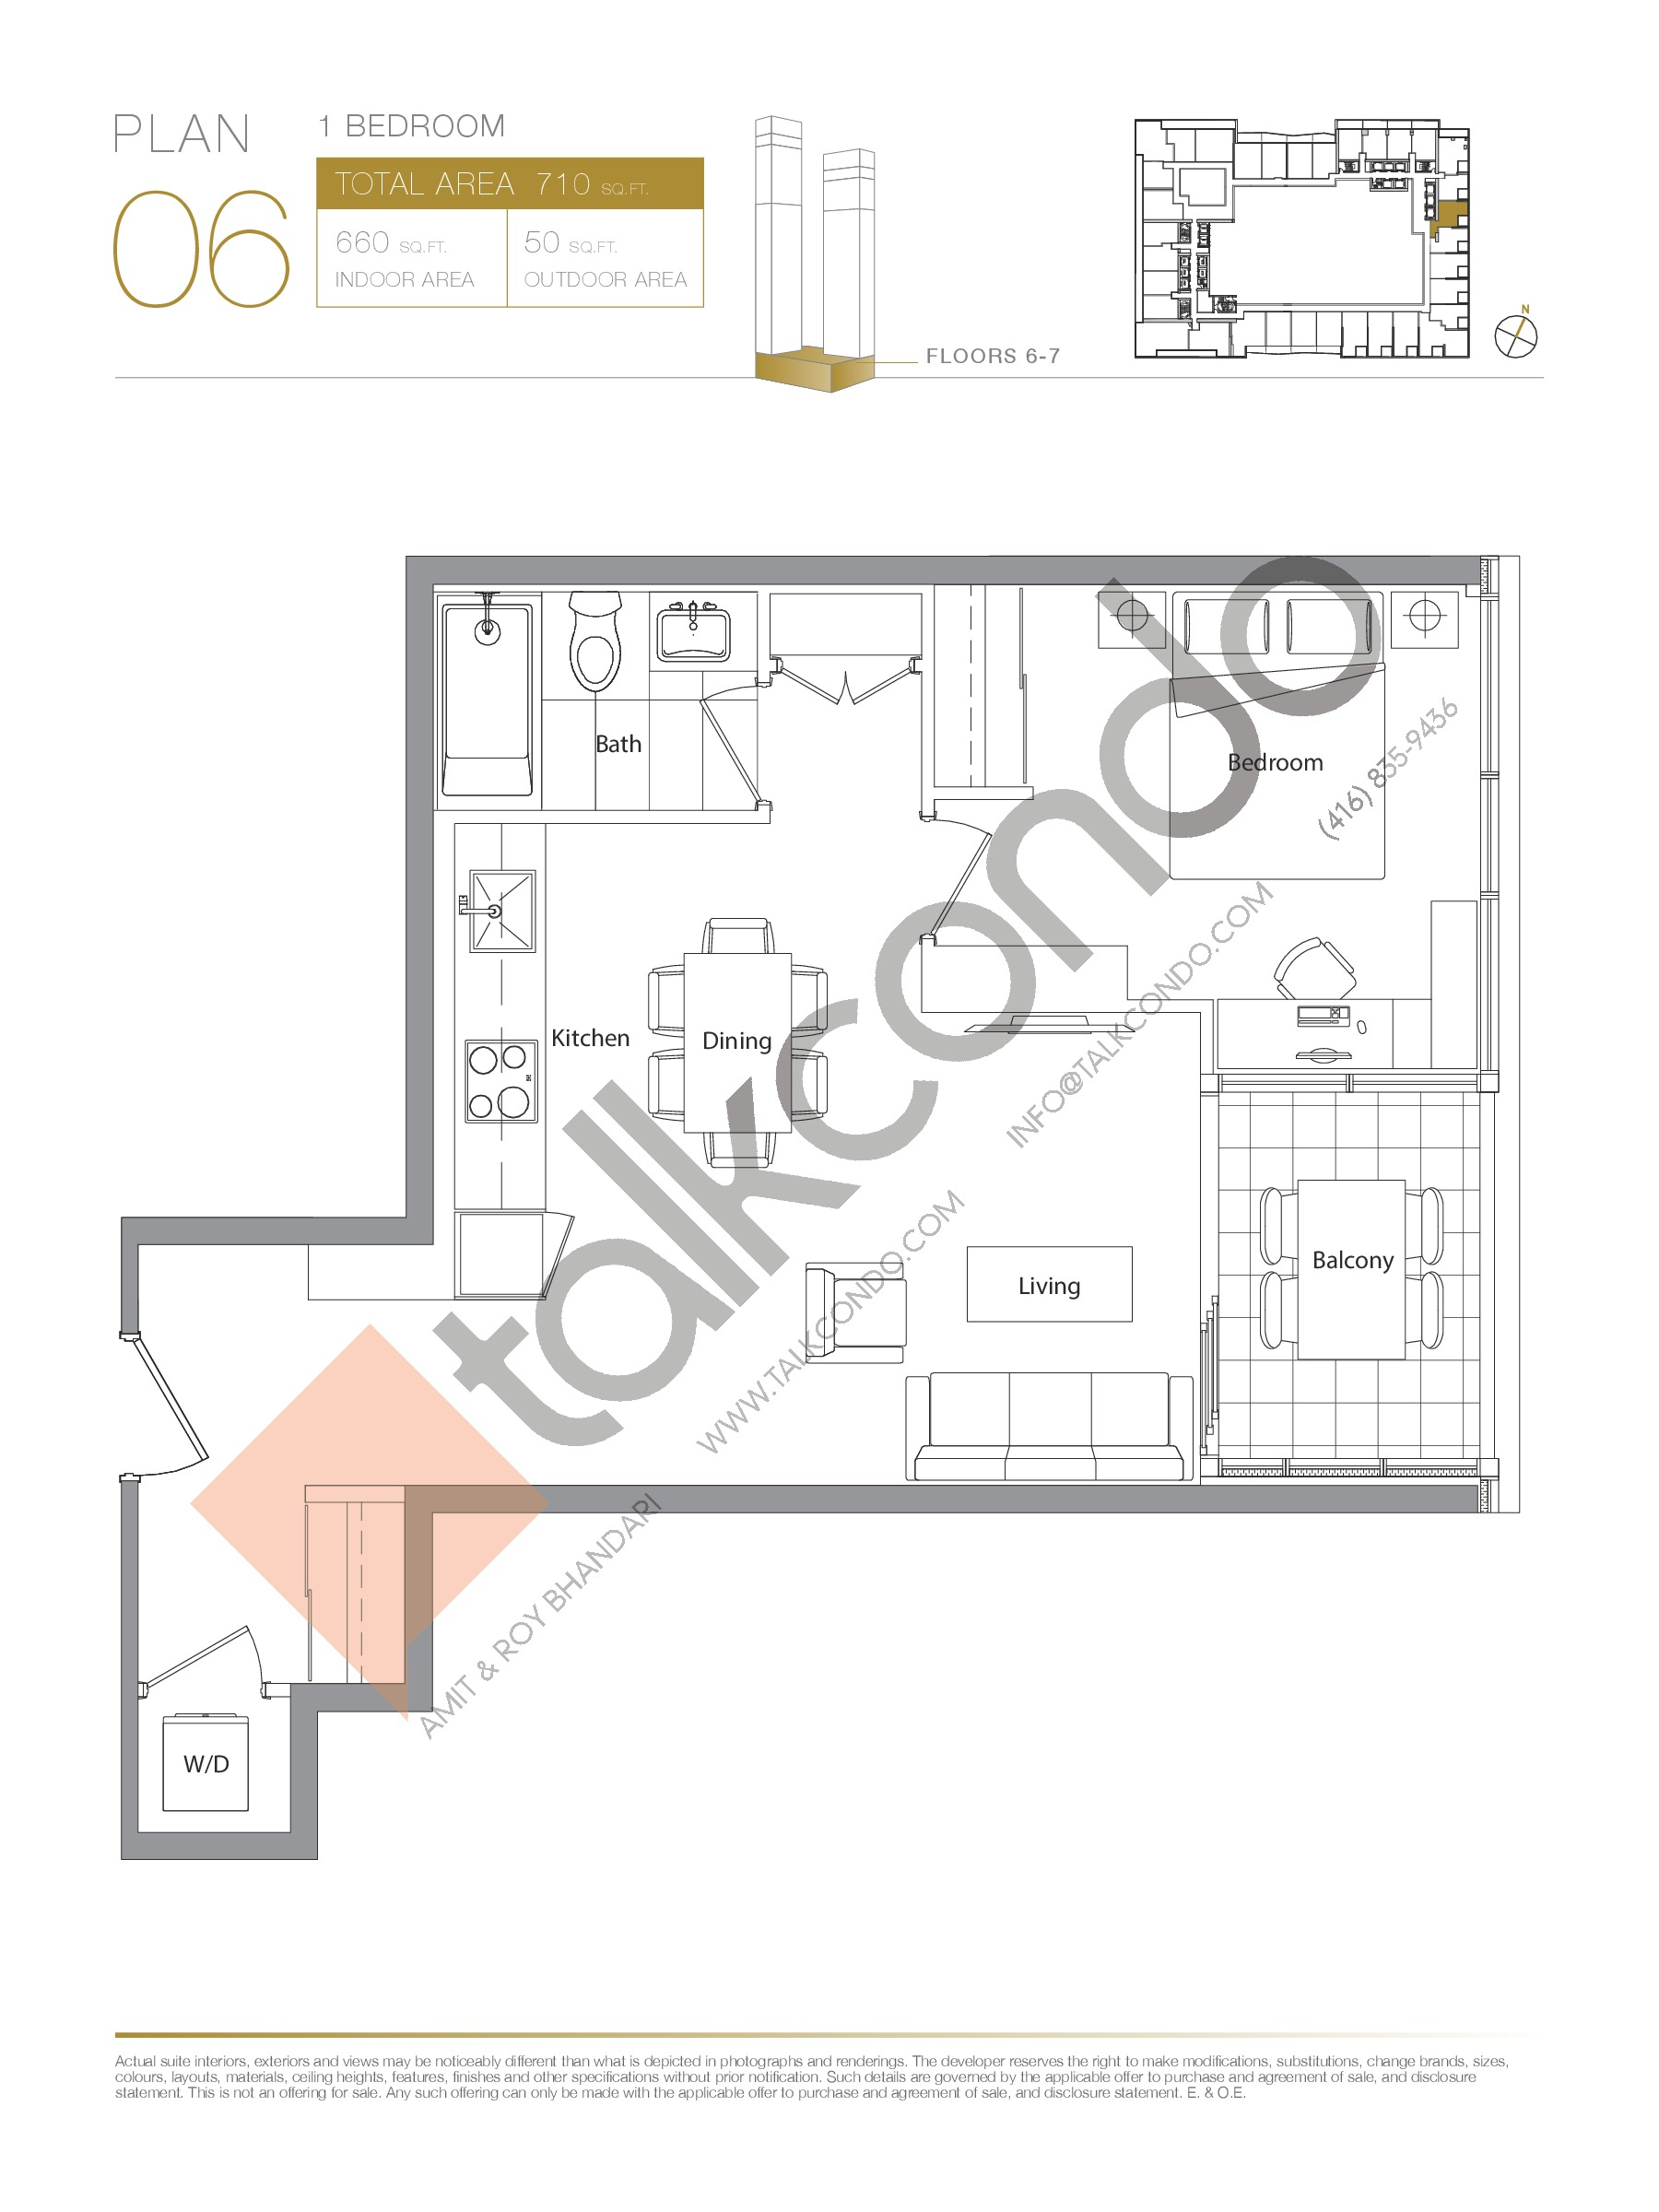 Plan 06 - Podium Floor Plan at Concord Canada House Condos - 660 sq.ft